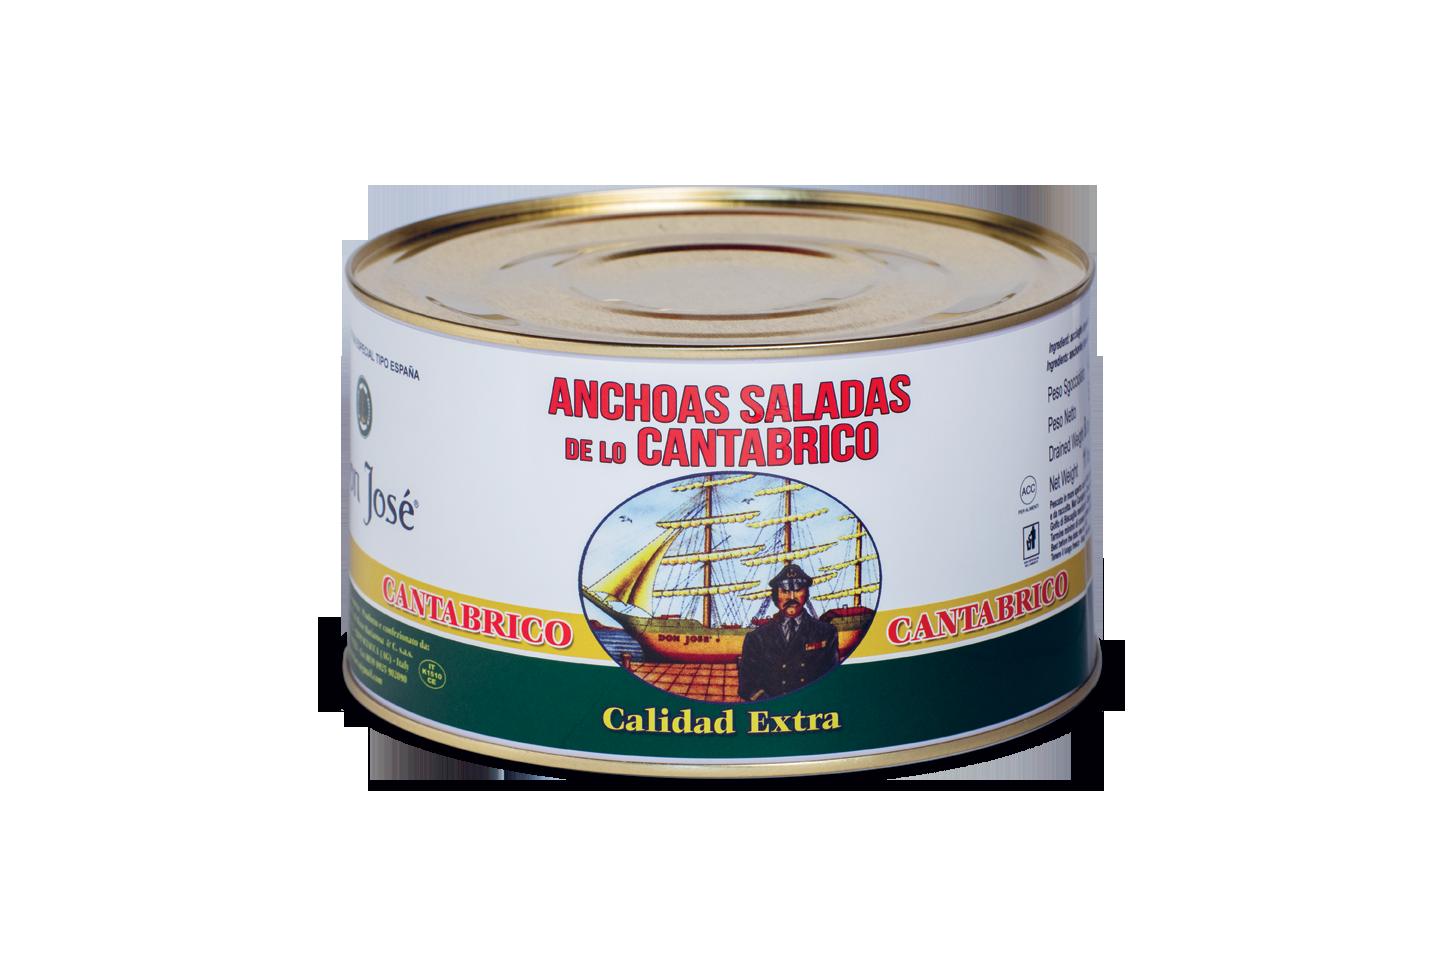 https://www.acciughesclafani.com/wp-content/uploads/2020/08/don-juan-cantabrico_M.png